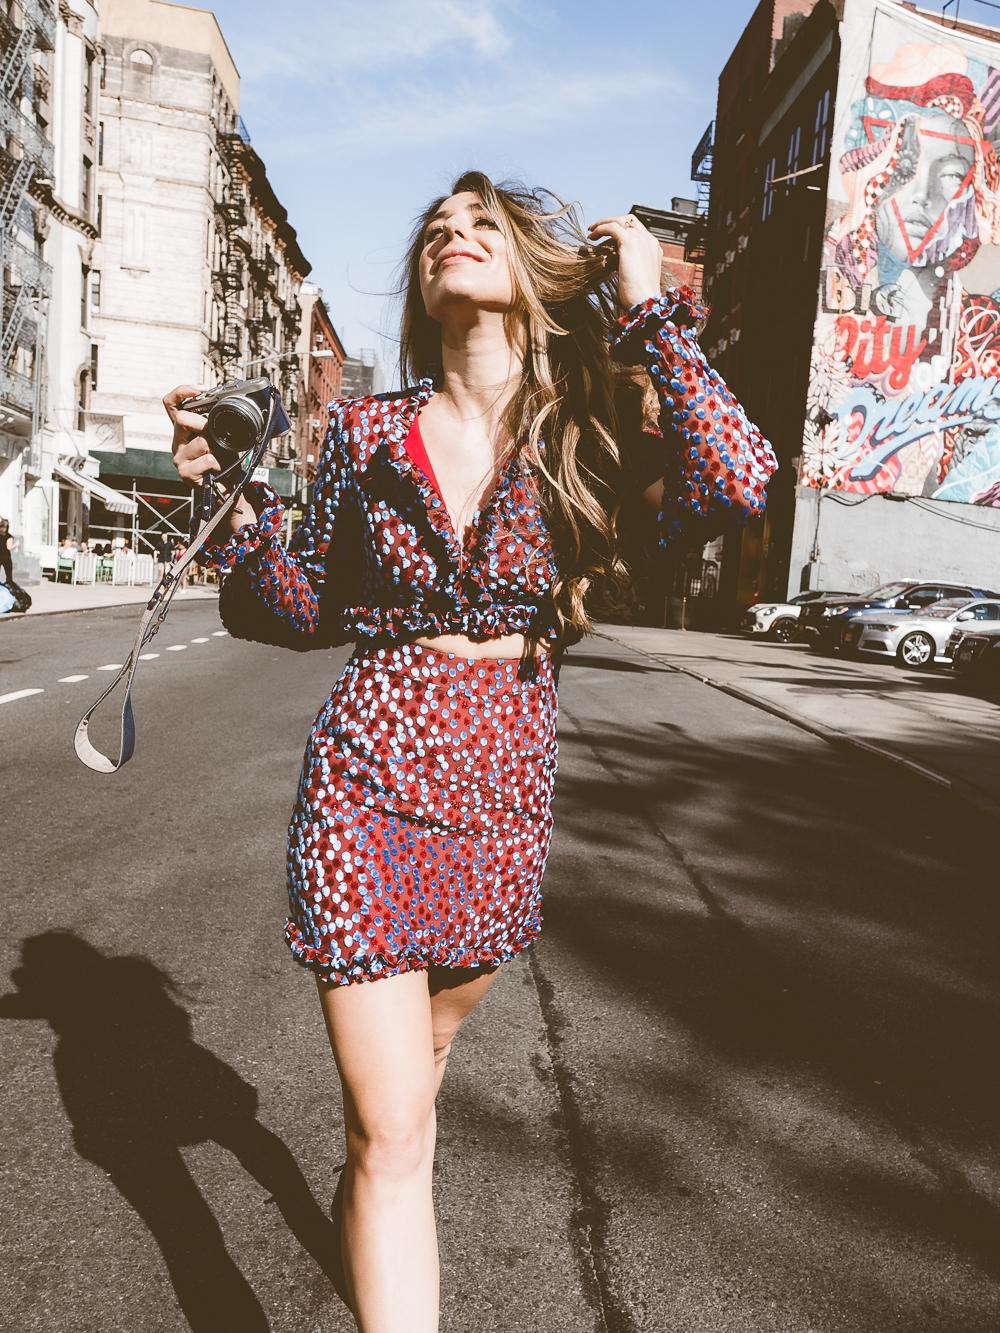 ASliceOPi Andrea Pion Blogger New York City NYC Olympus PEN E-PL9